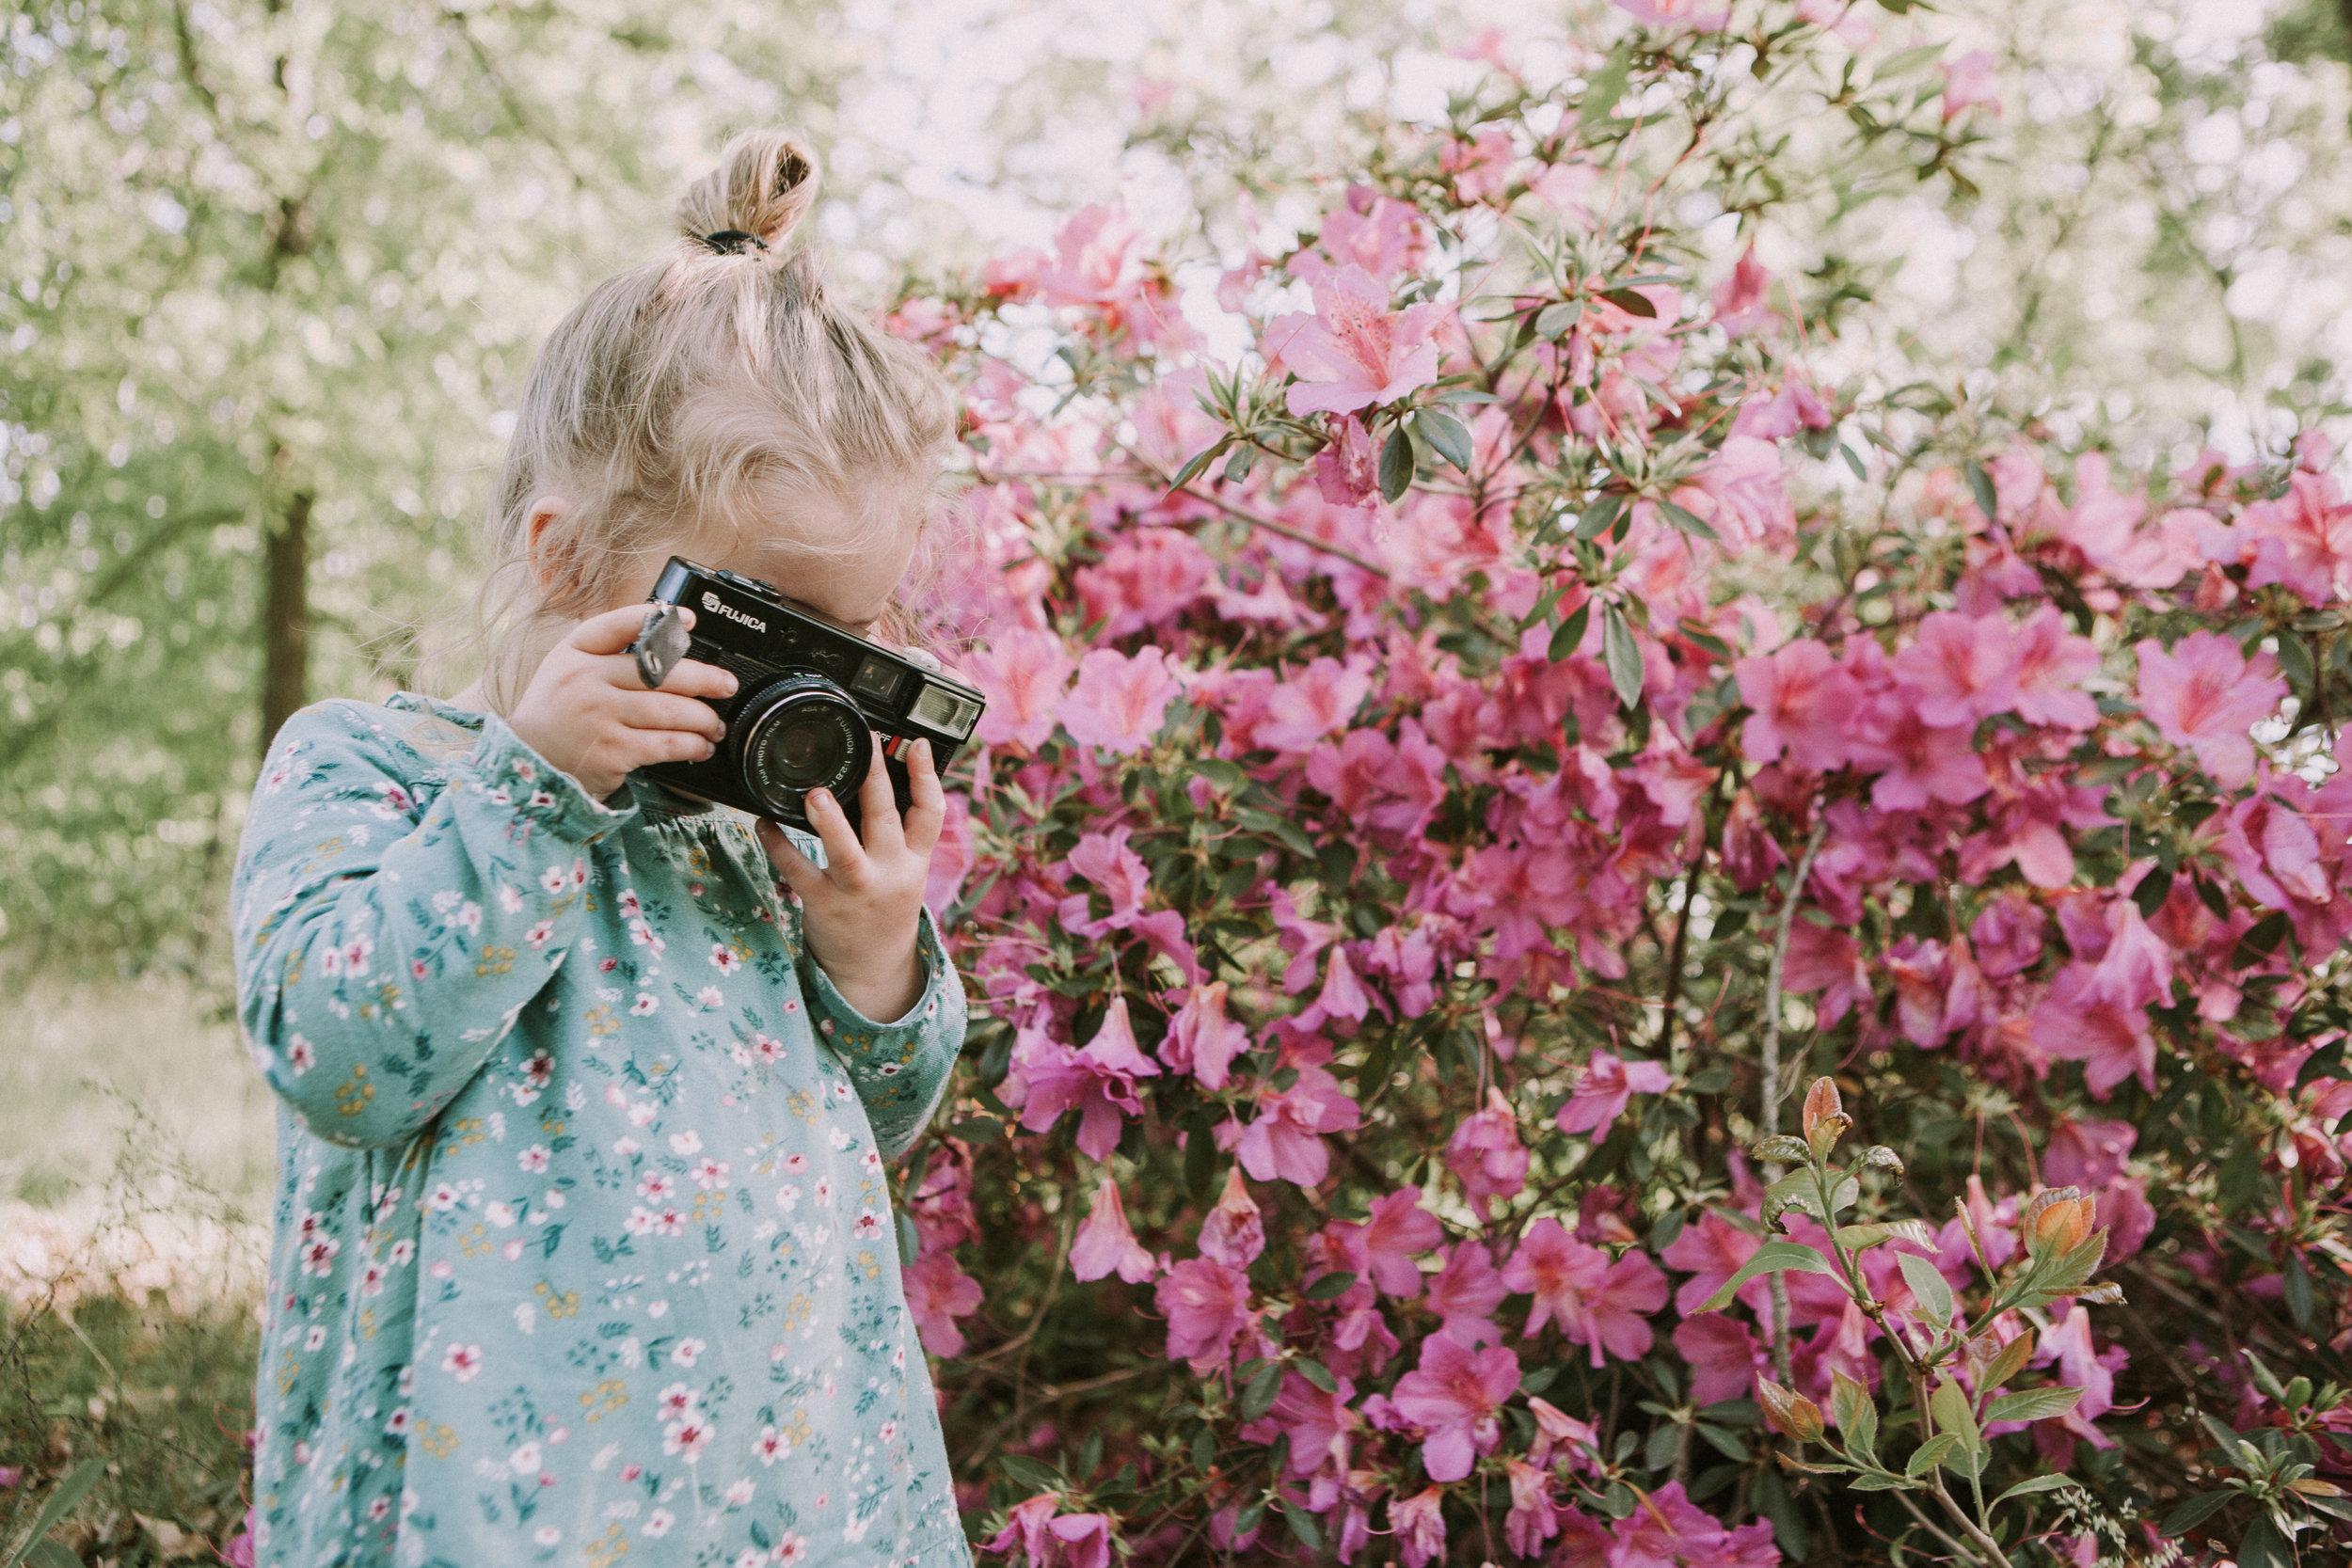 Christina-Hussey-Photography-2.jpg